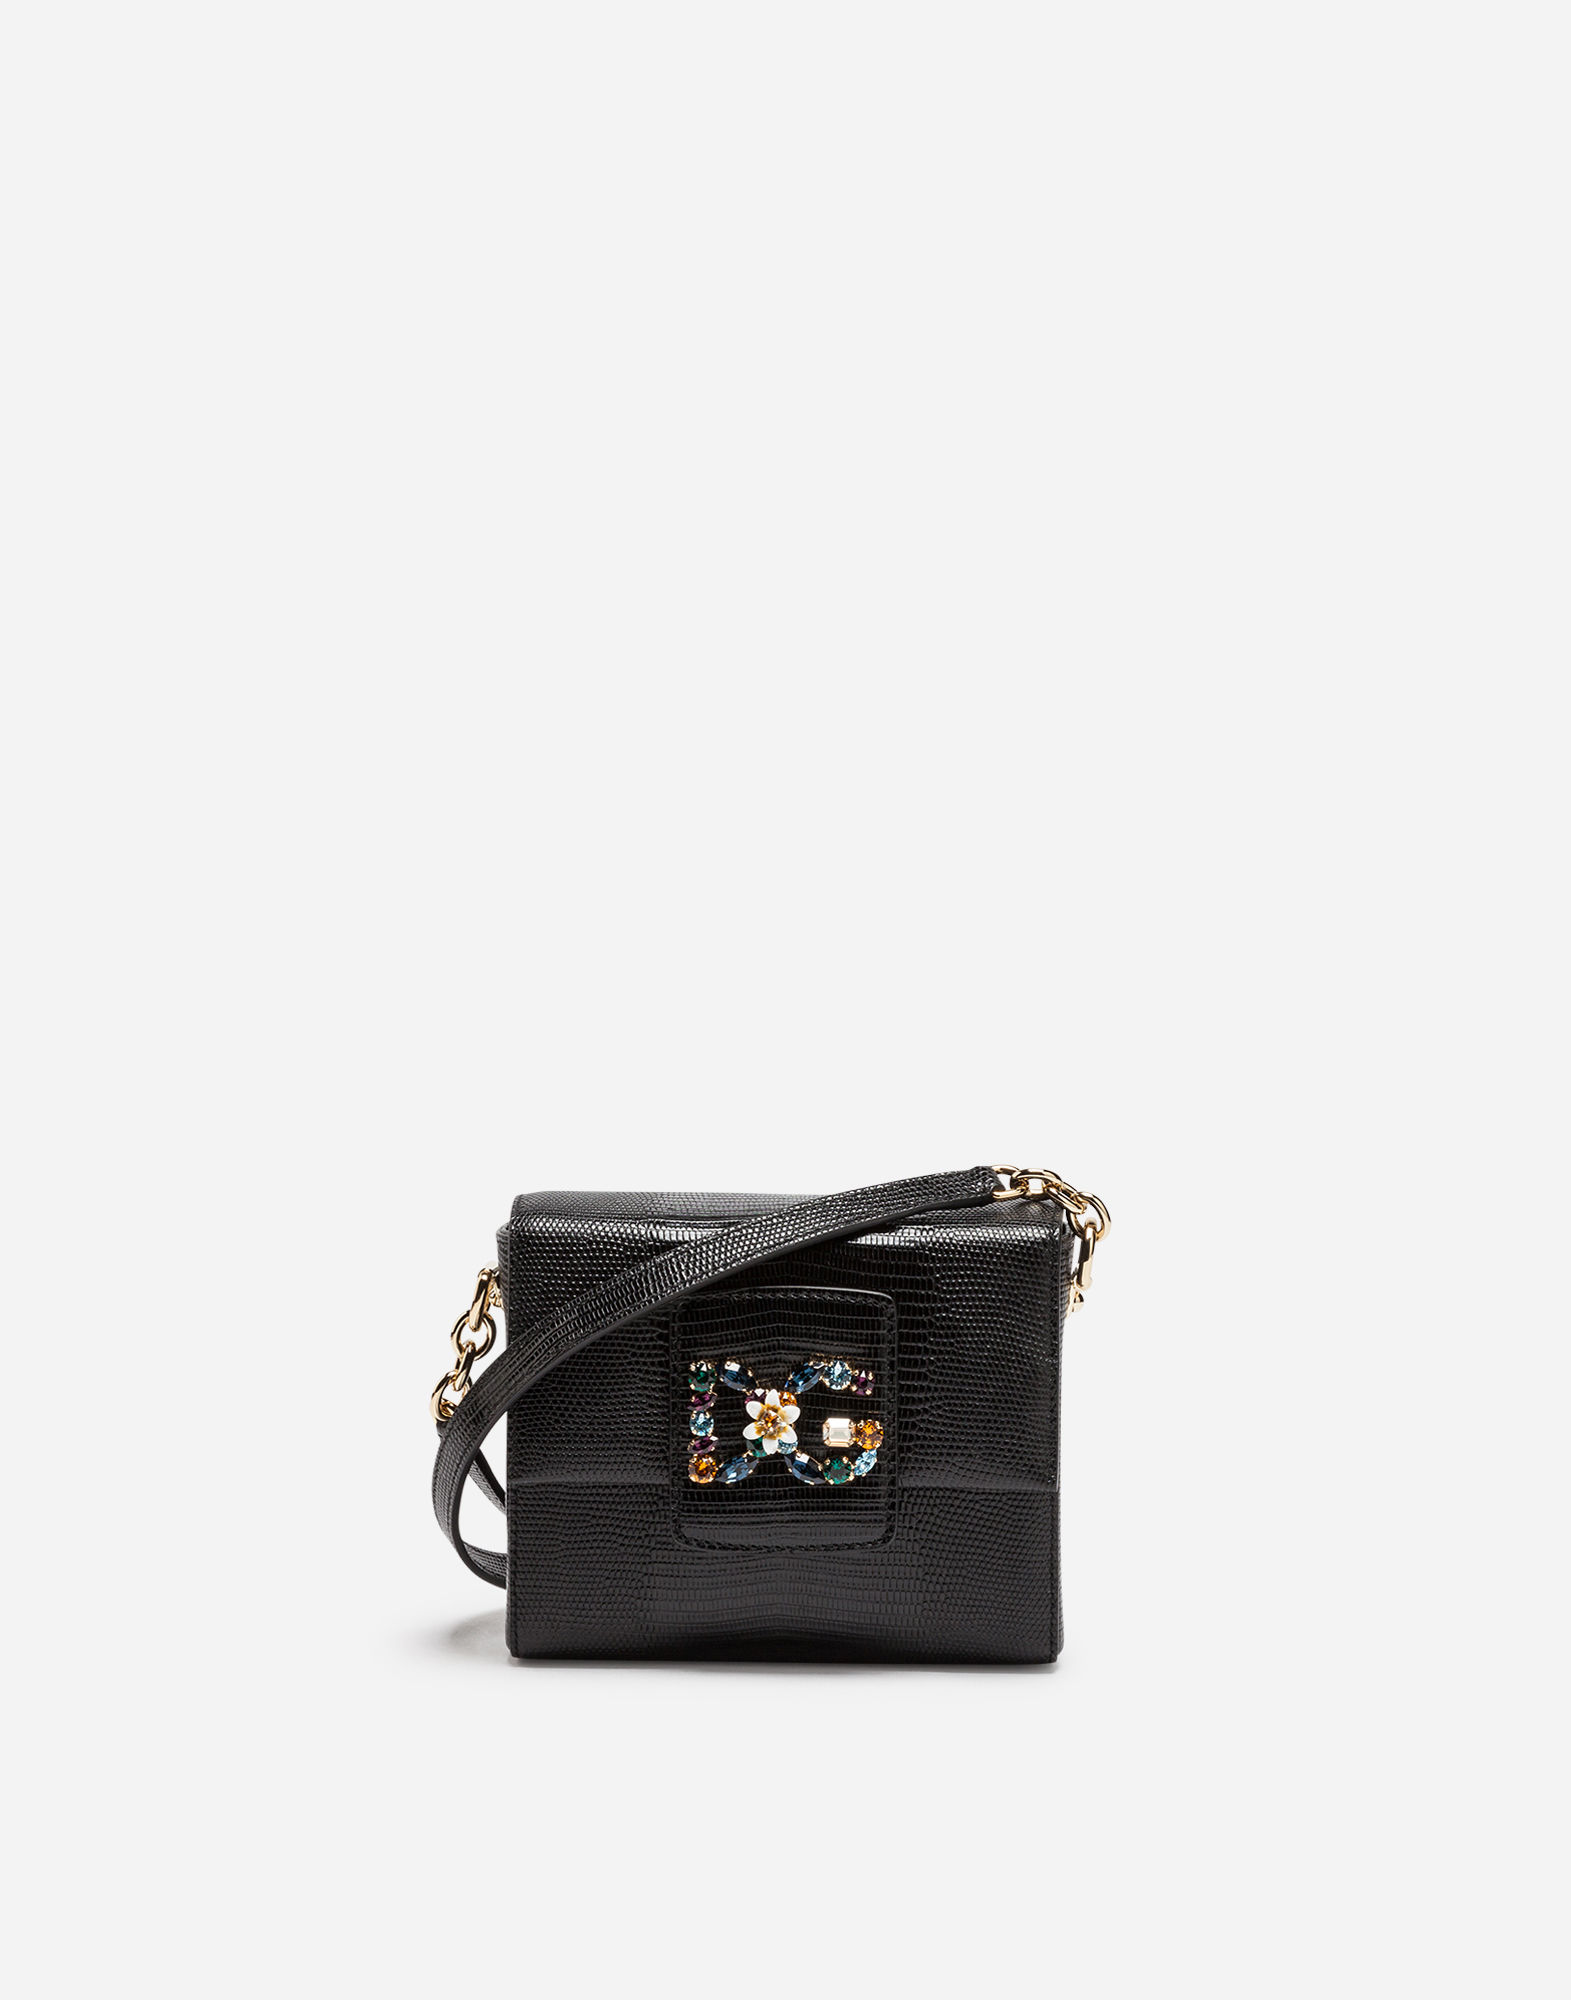 Dg Millennials Bag In Leather in Black